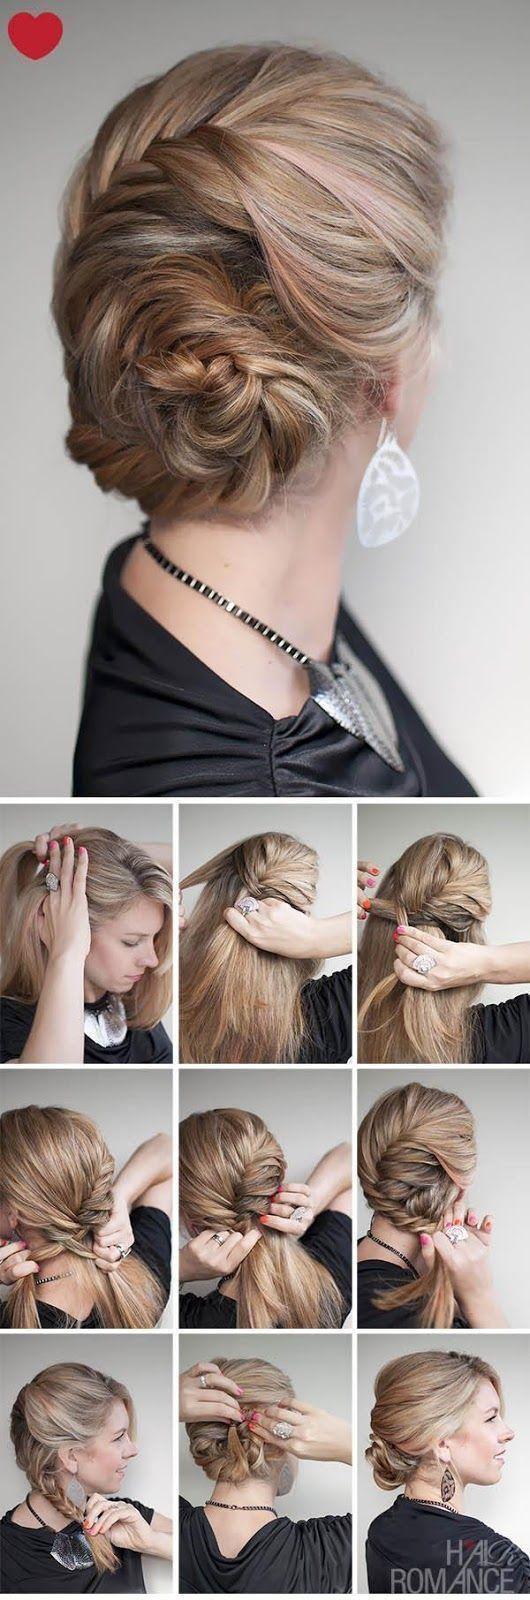 How To Do Hairstyles Tutorials Step By Step For Long Hair | Medium Hair | Short Hair